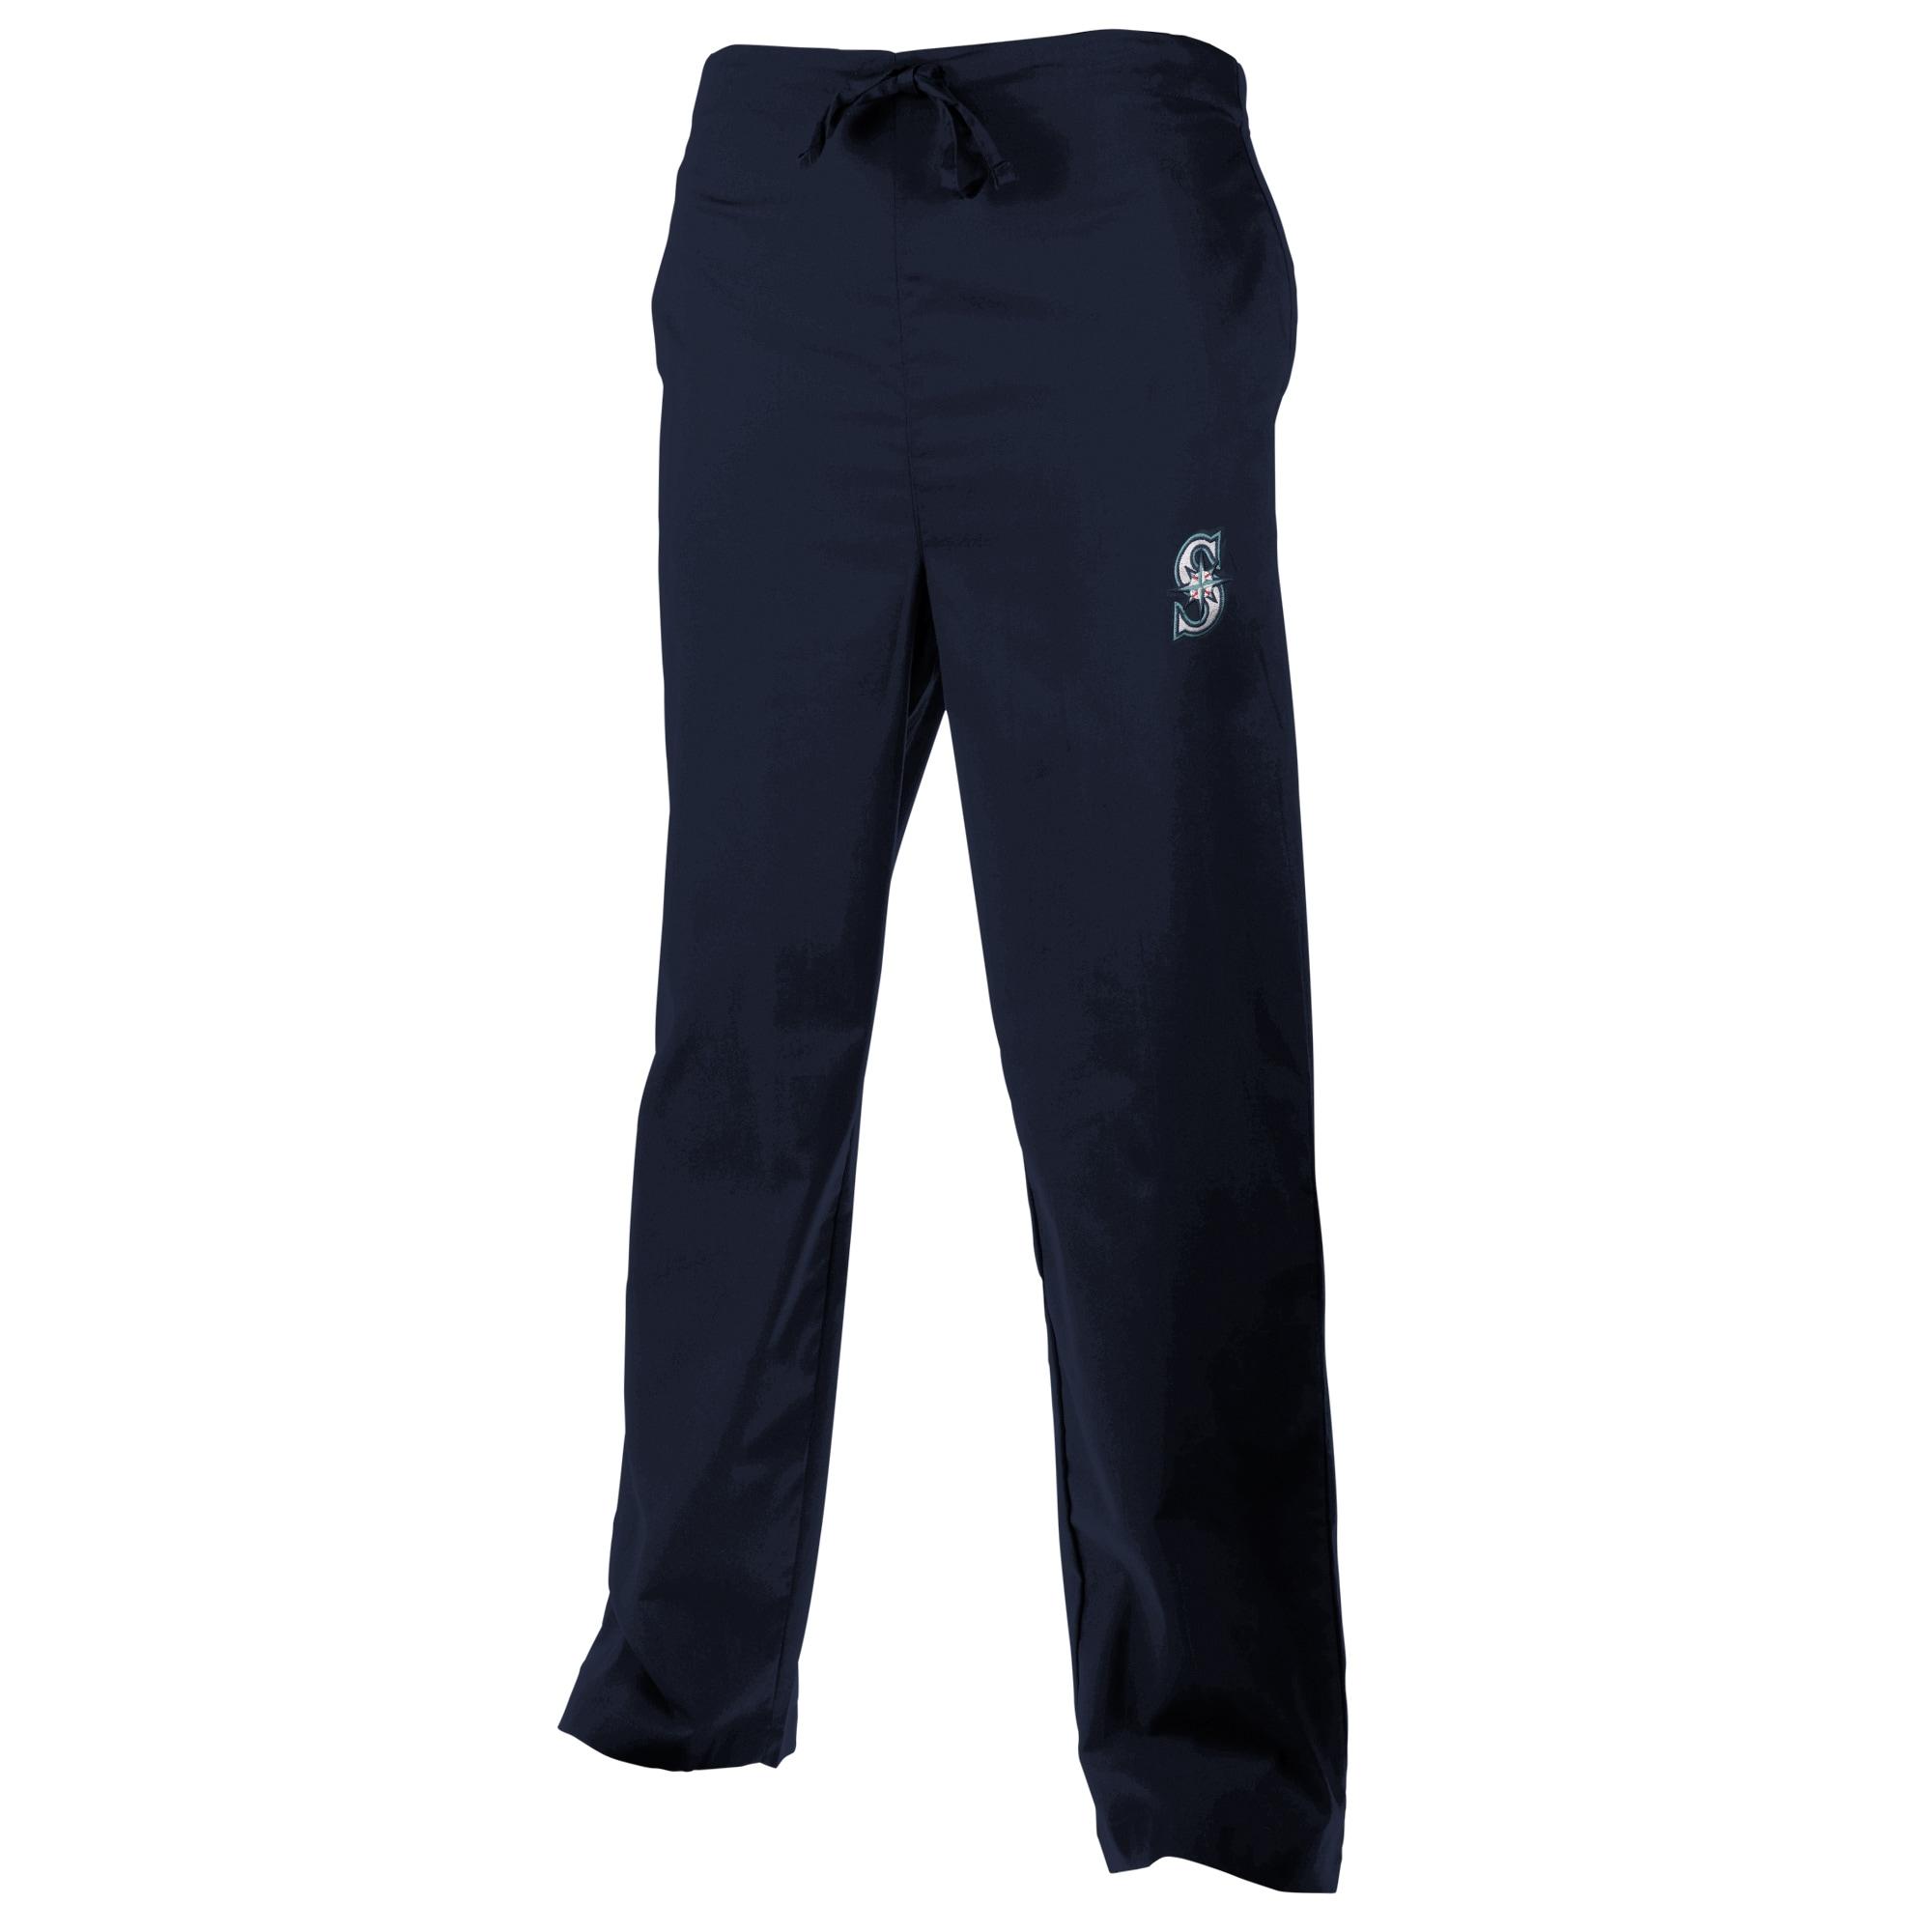 Seattle Mariners Unisex Scrub Pants - Navy Blue